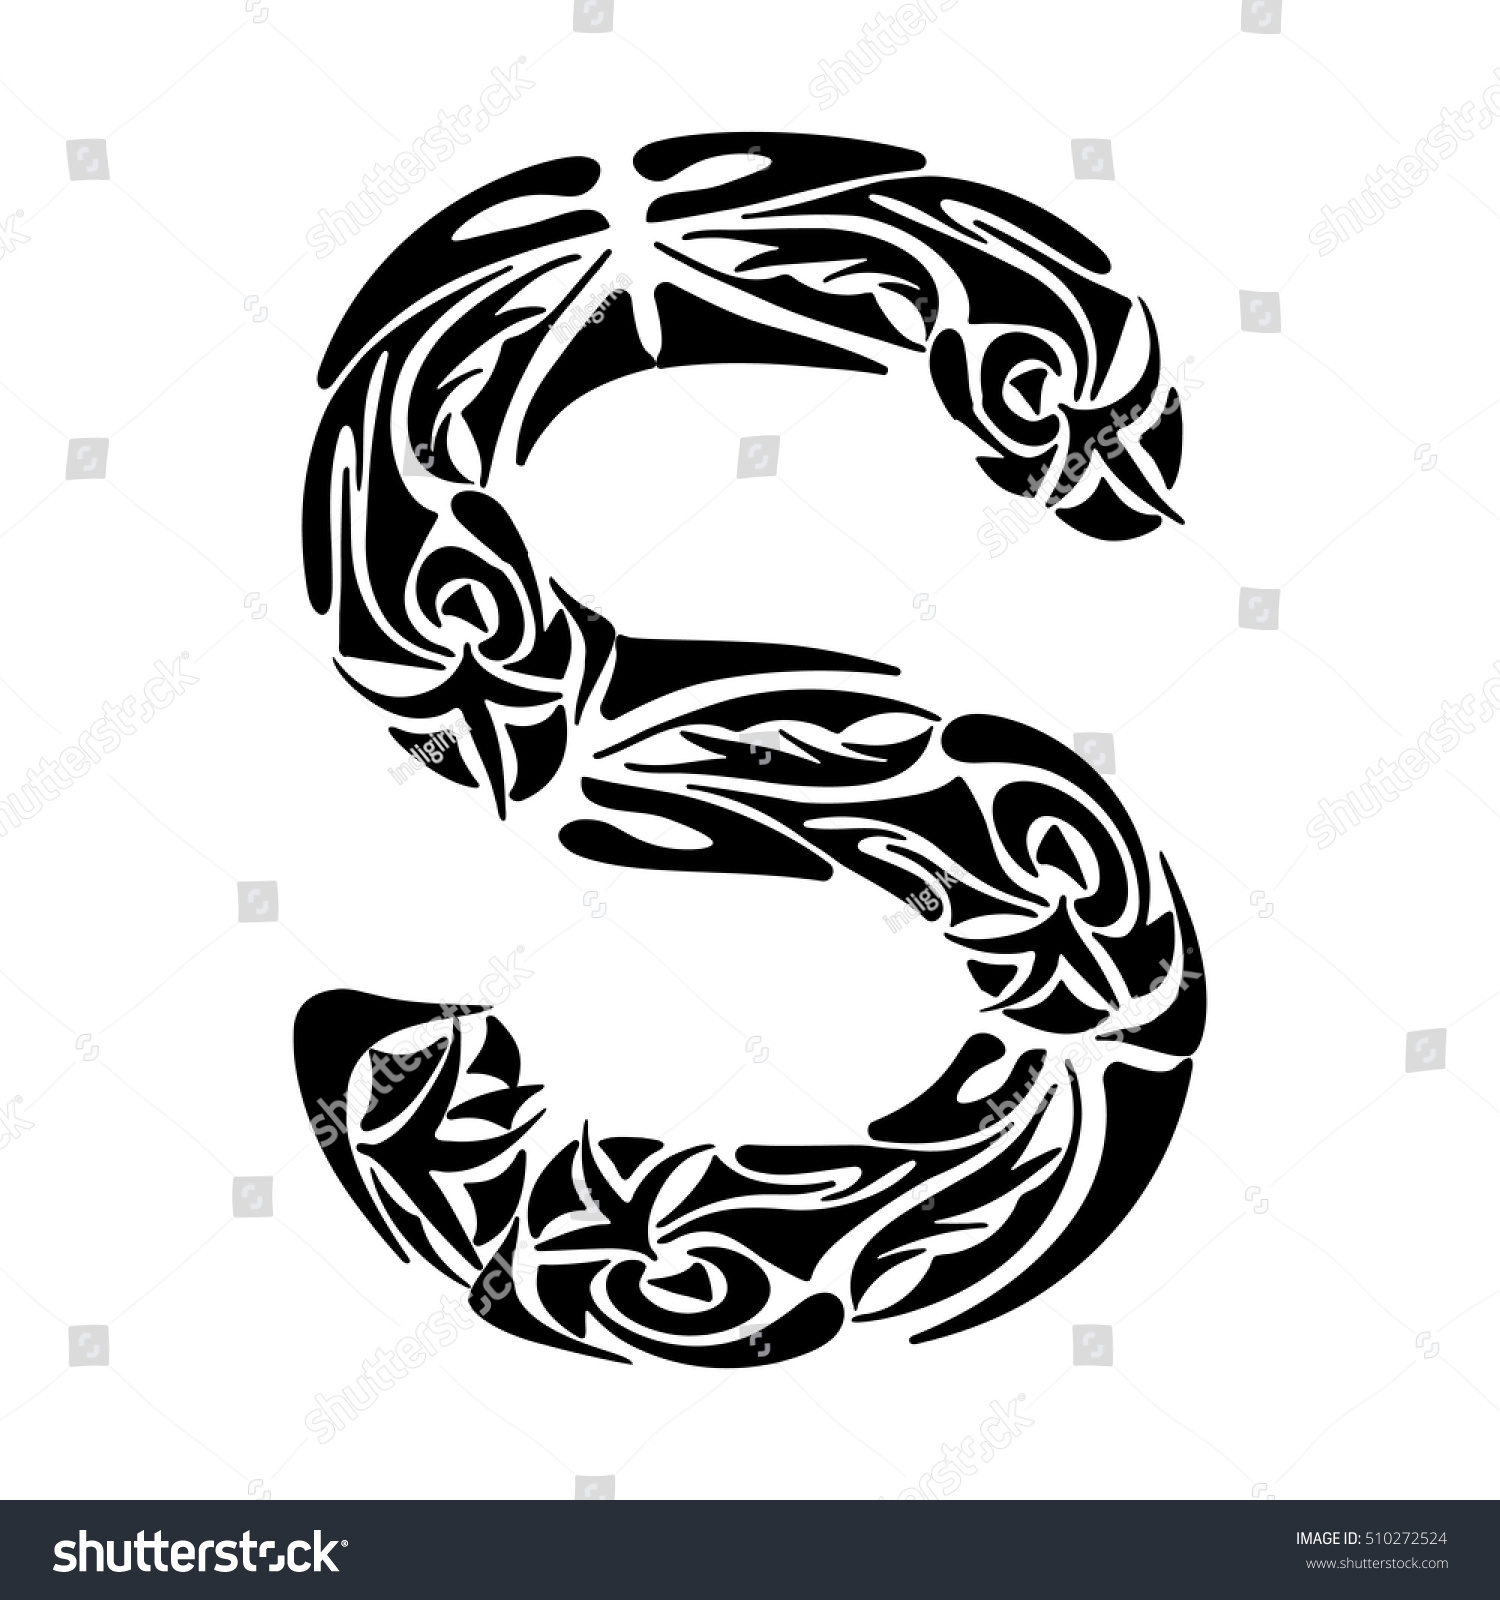 Polynesian tattoo initials tribal capital letter stock vector polynesian tattoo initials tribal capital letter s vector illustration for coloring page tattoos thecheapjerseys Choice Image